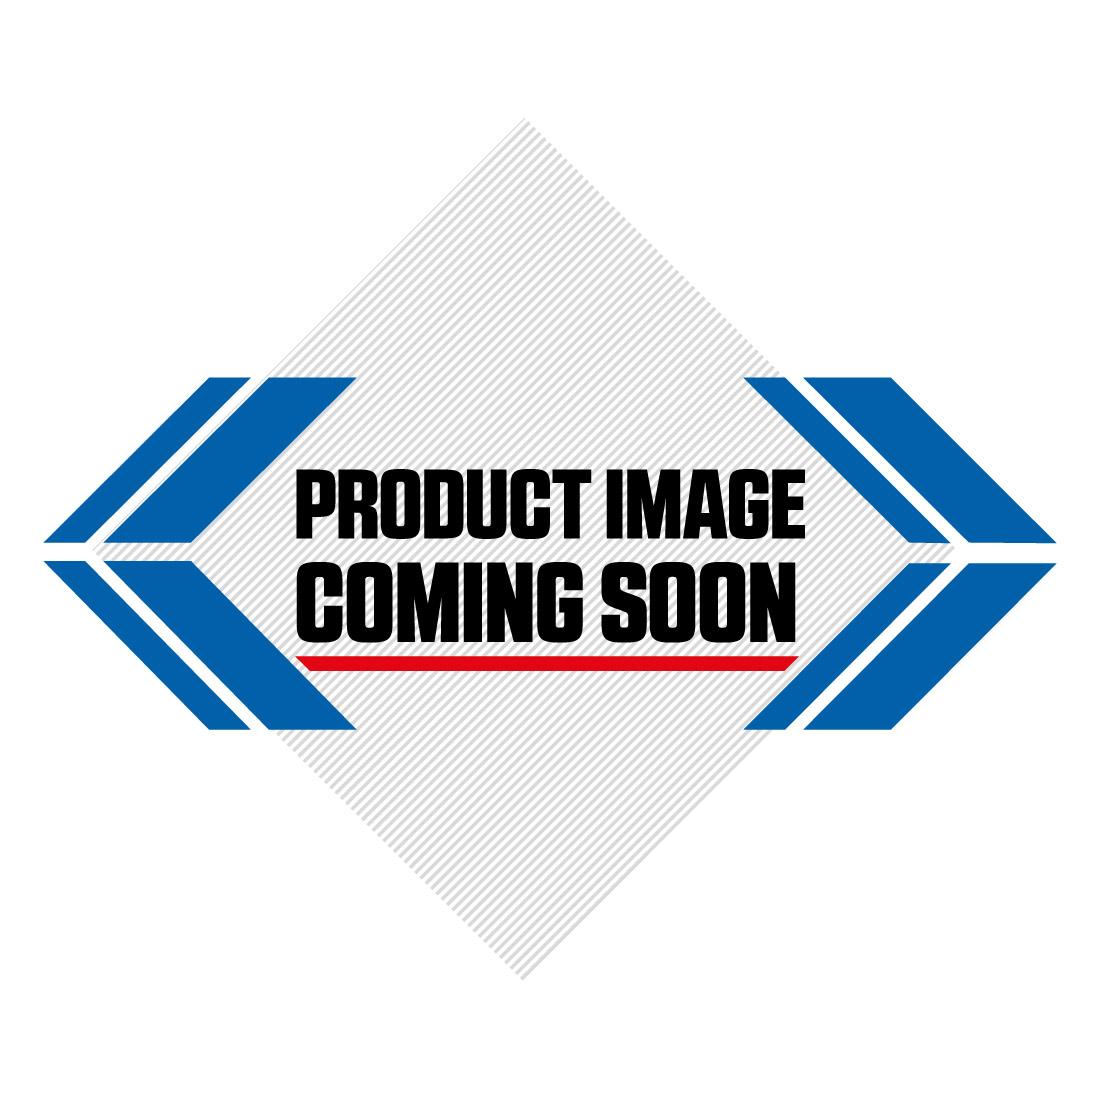 DJI Mavic 2 Pro Drone Image-3